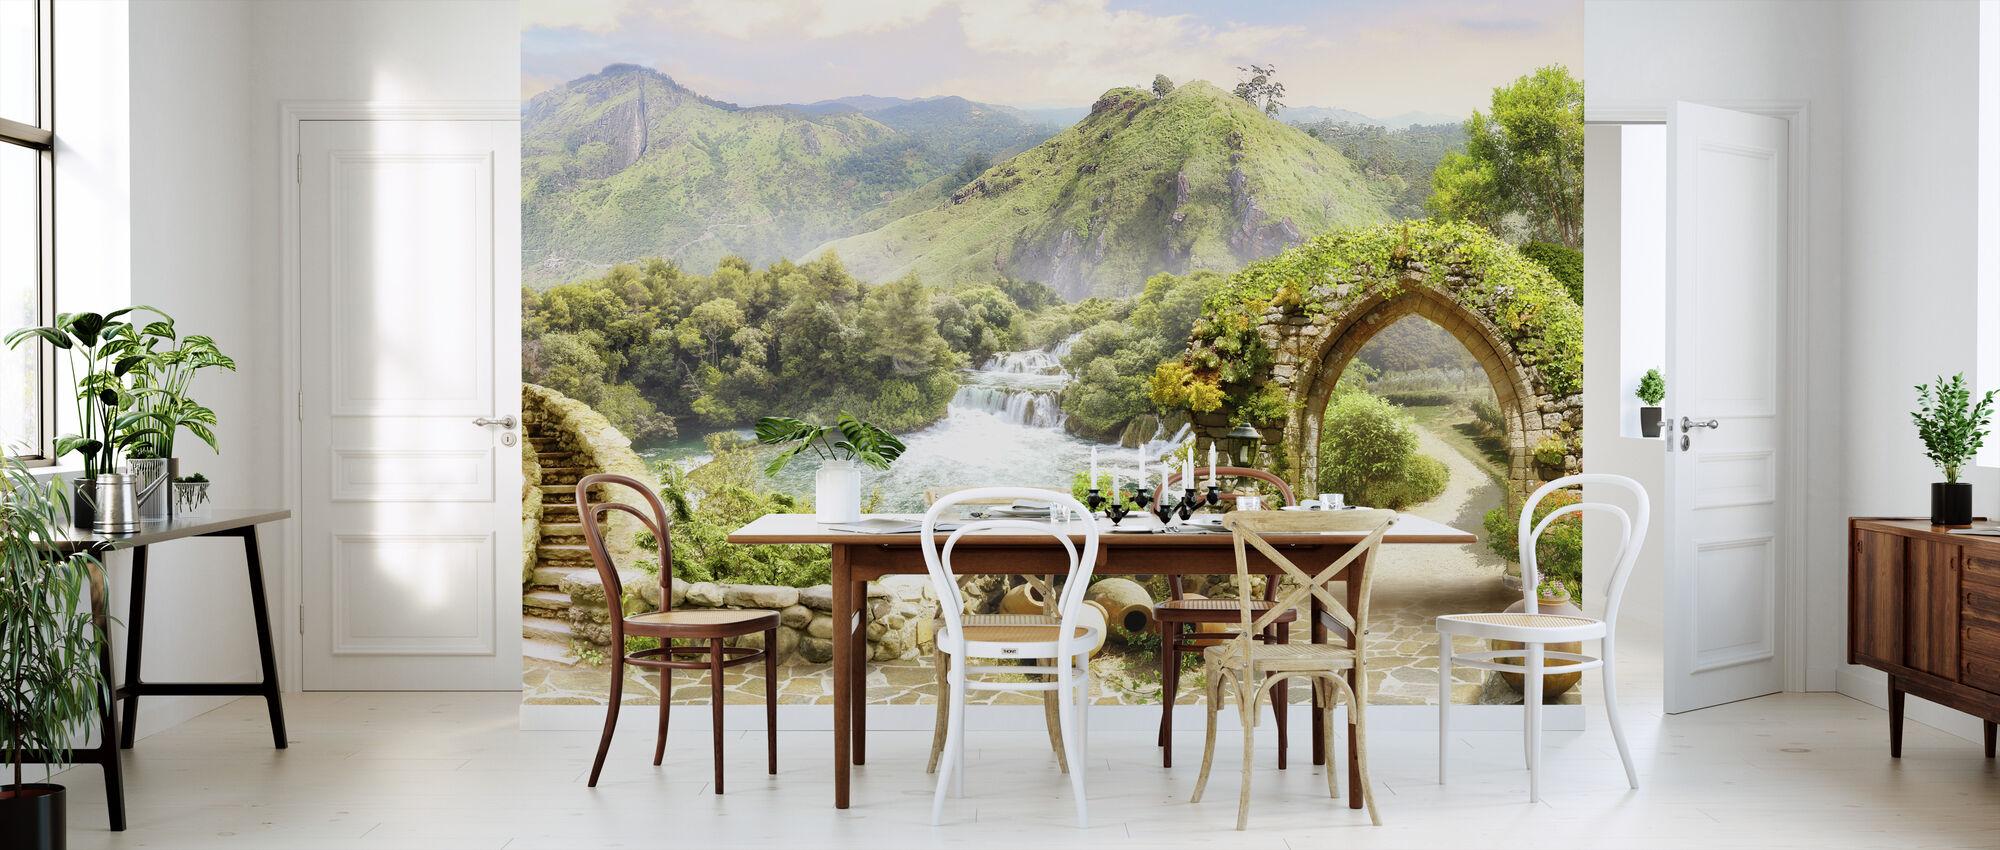 Peaceful Scenery - Wallpaper - Kitchen